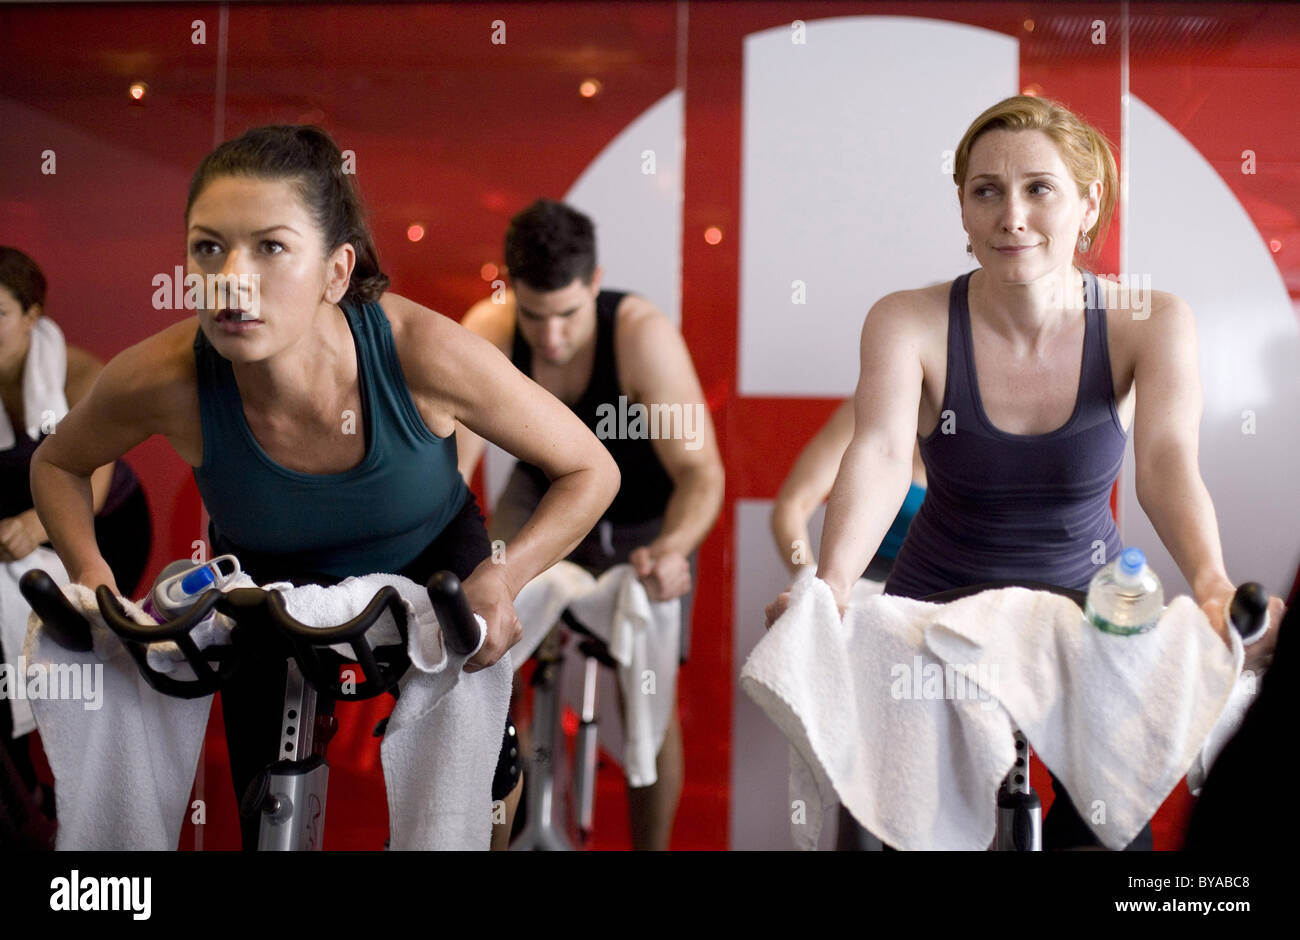 The rebound Year : 2009 USA Director : Bart Freundlich Catherine Zeta-Jones, Kate Jennings Grant - Stock Image